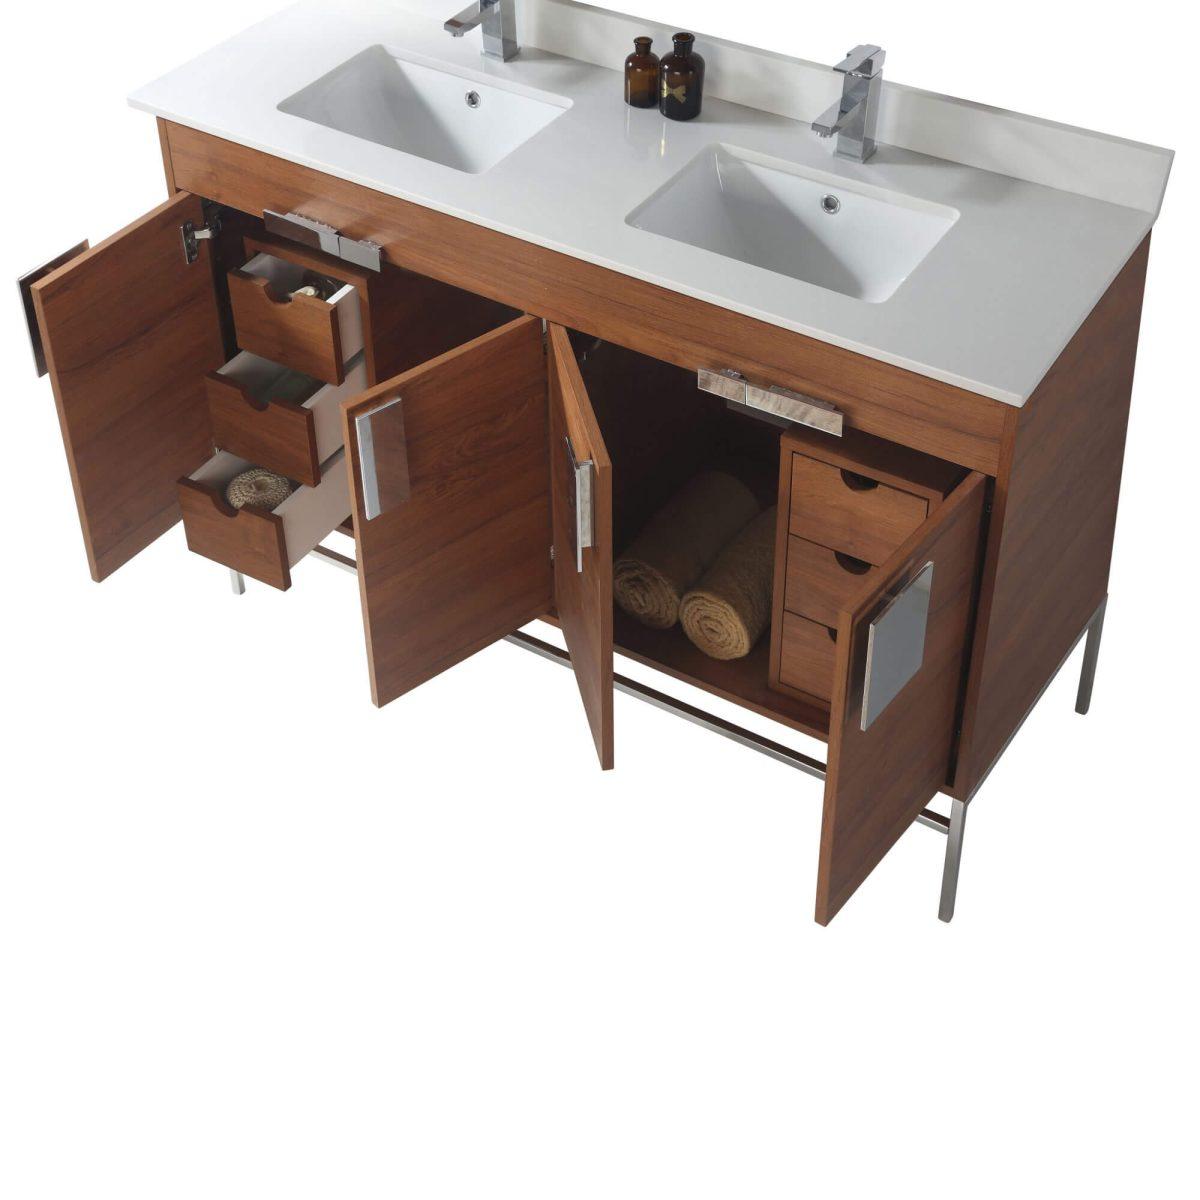 "Shawbridge 60"" Modern Double Bathroom Vanity  Spicy Walnut with Chrome Hardware"